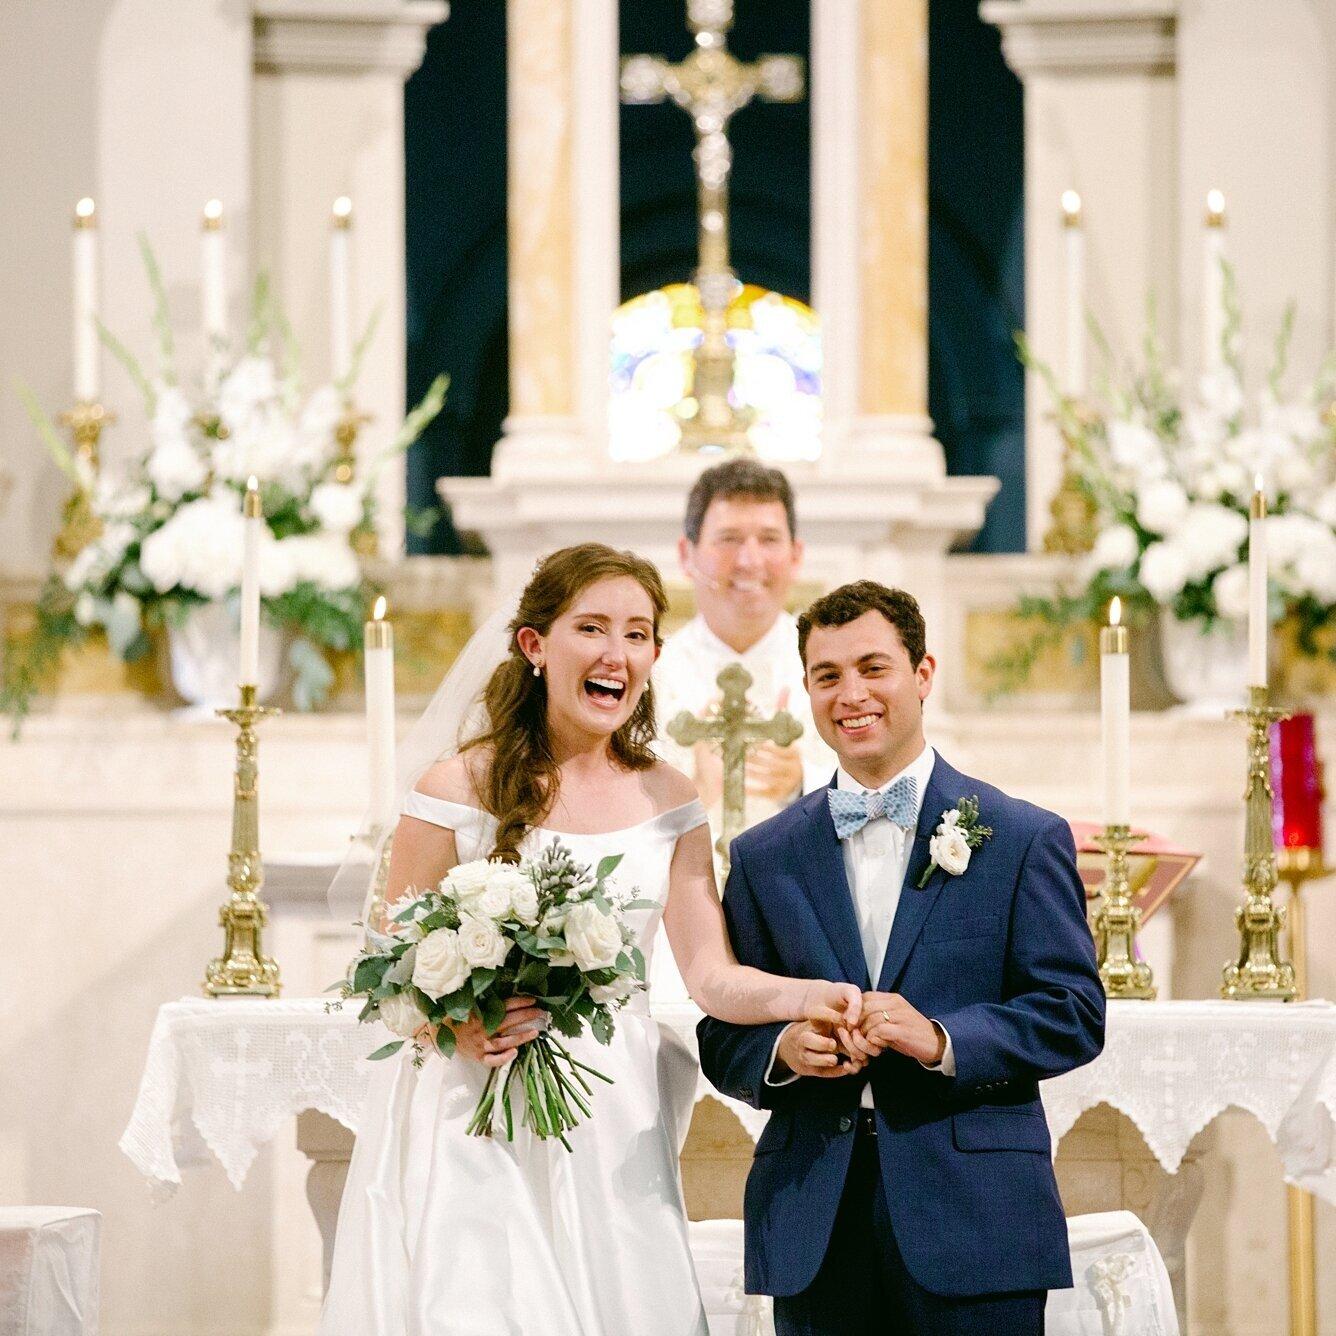 Bay_St_Louis_Wedding_Photographer_0541.jpg